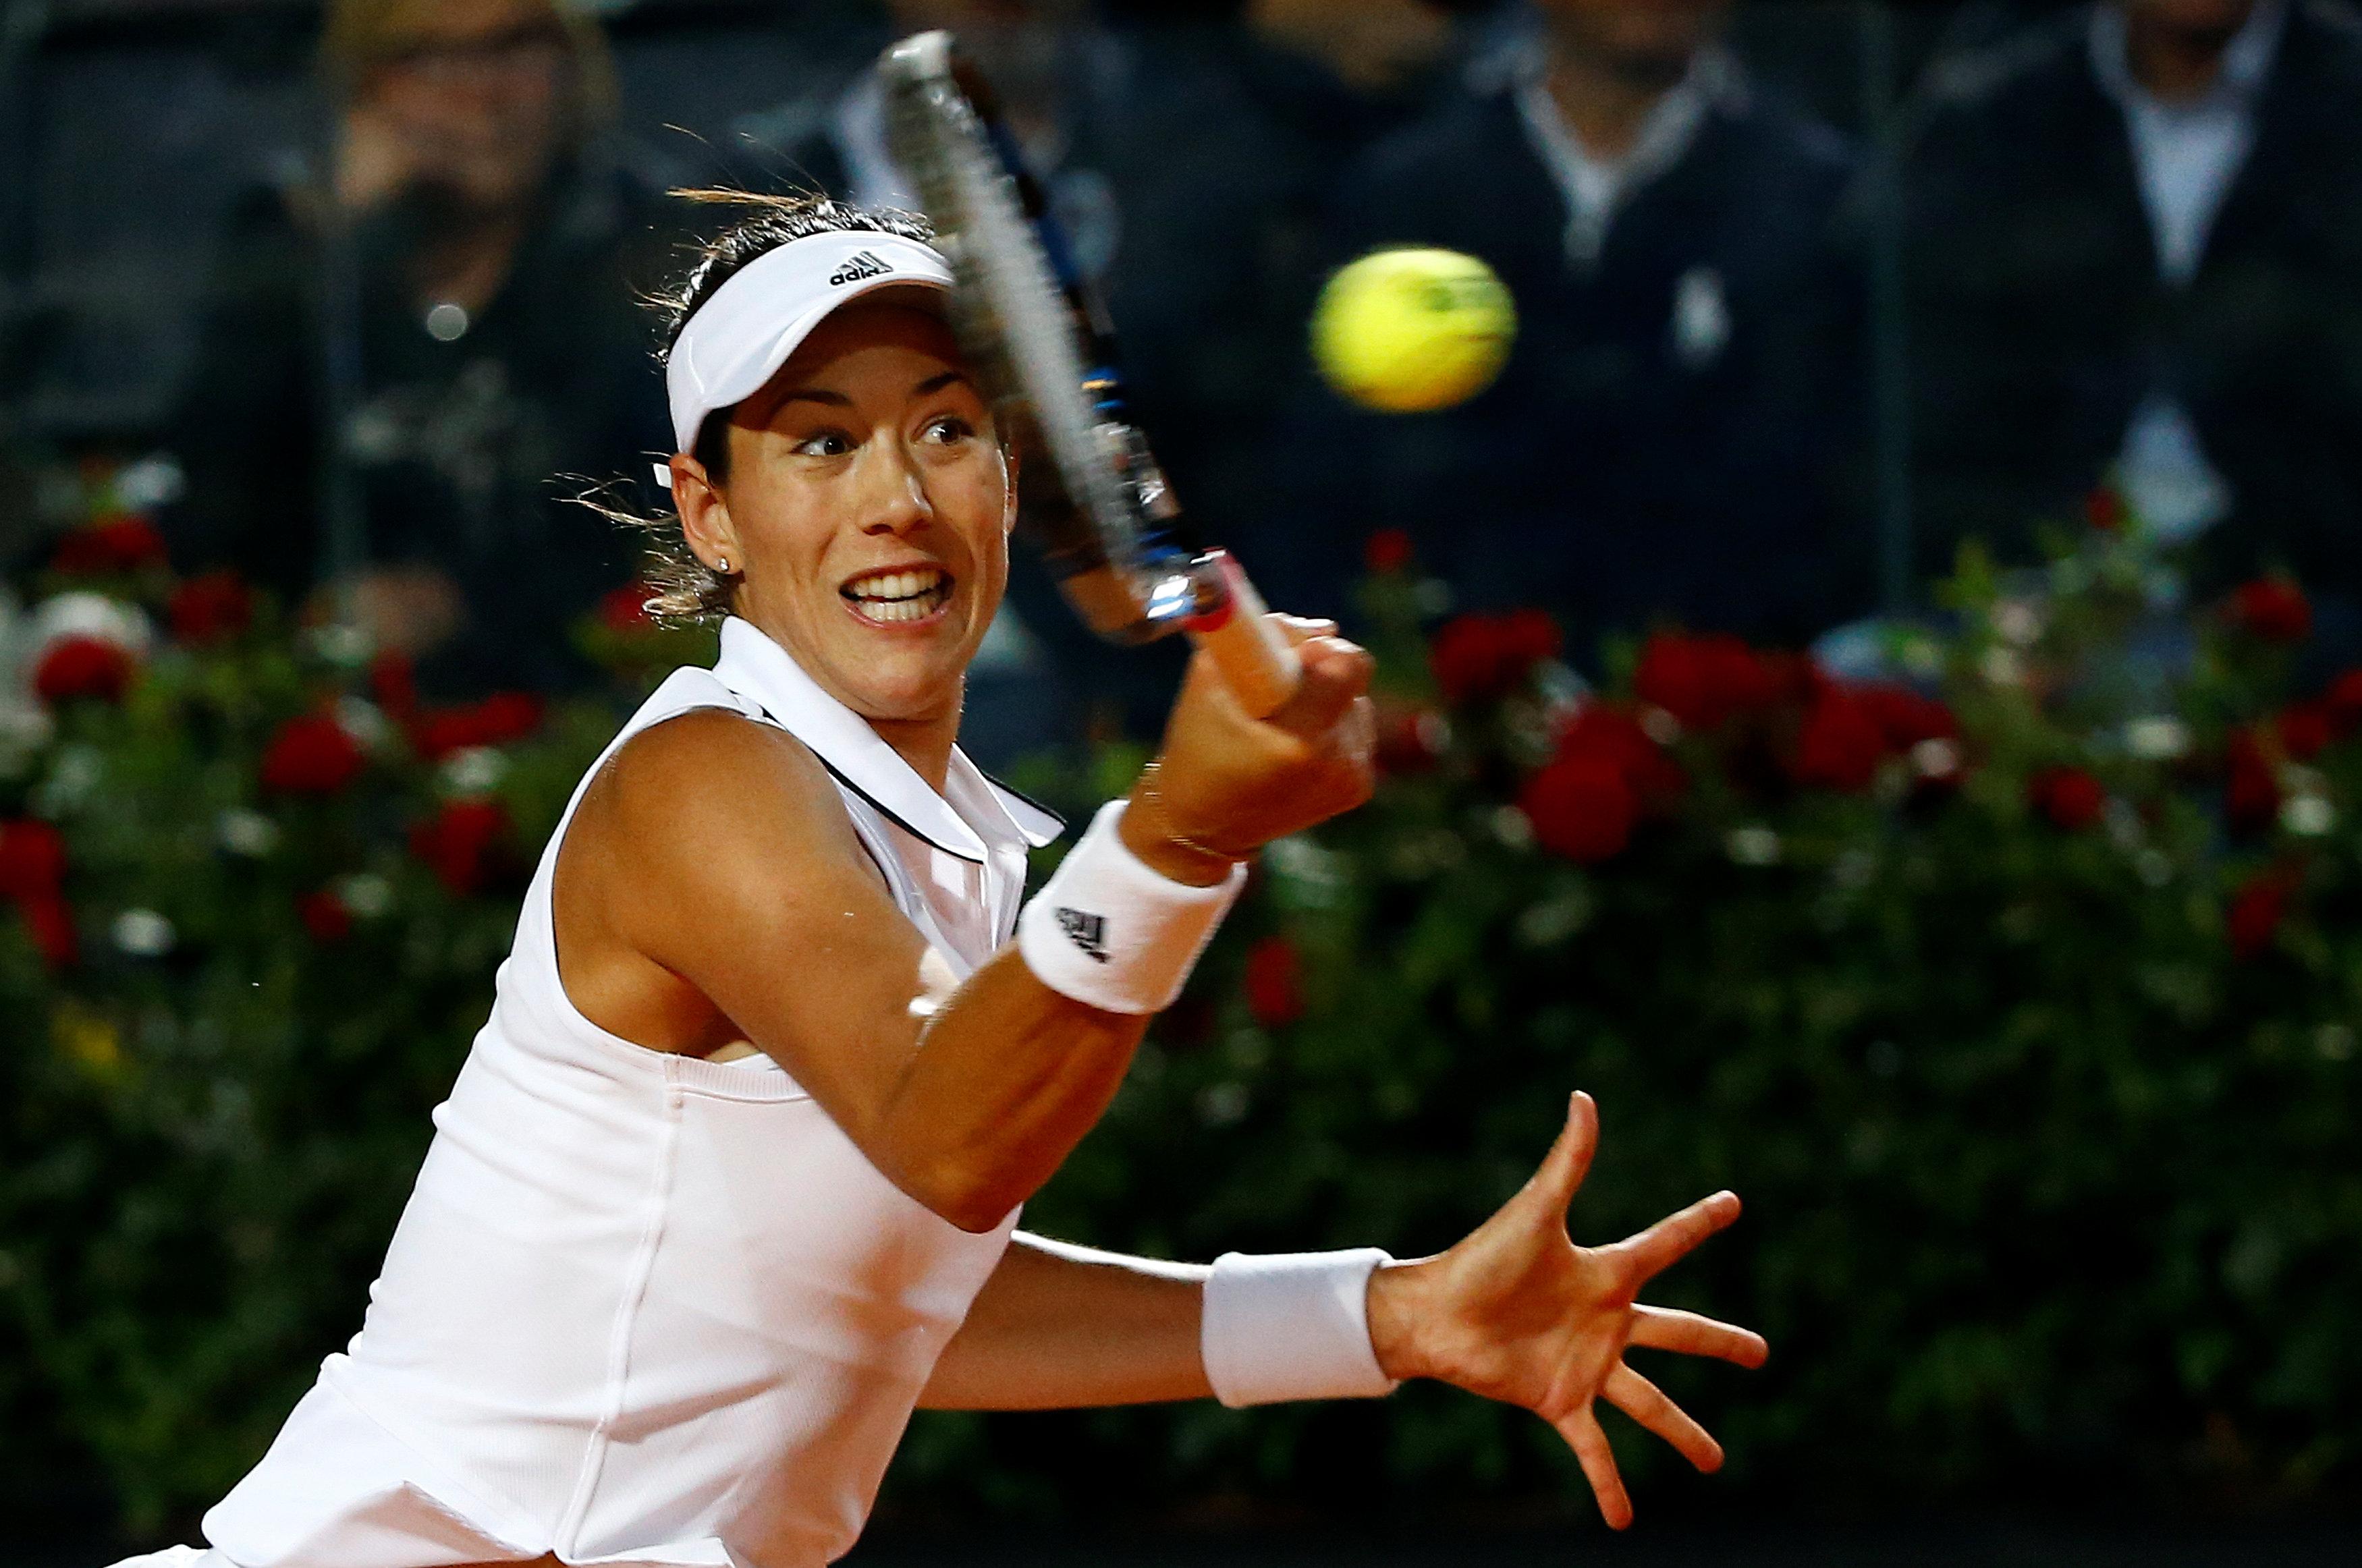 Tennis: Muguruza beats Venus to reach Italian Open semifinals